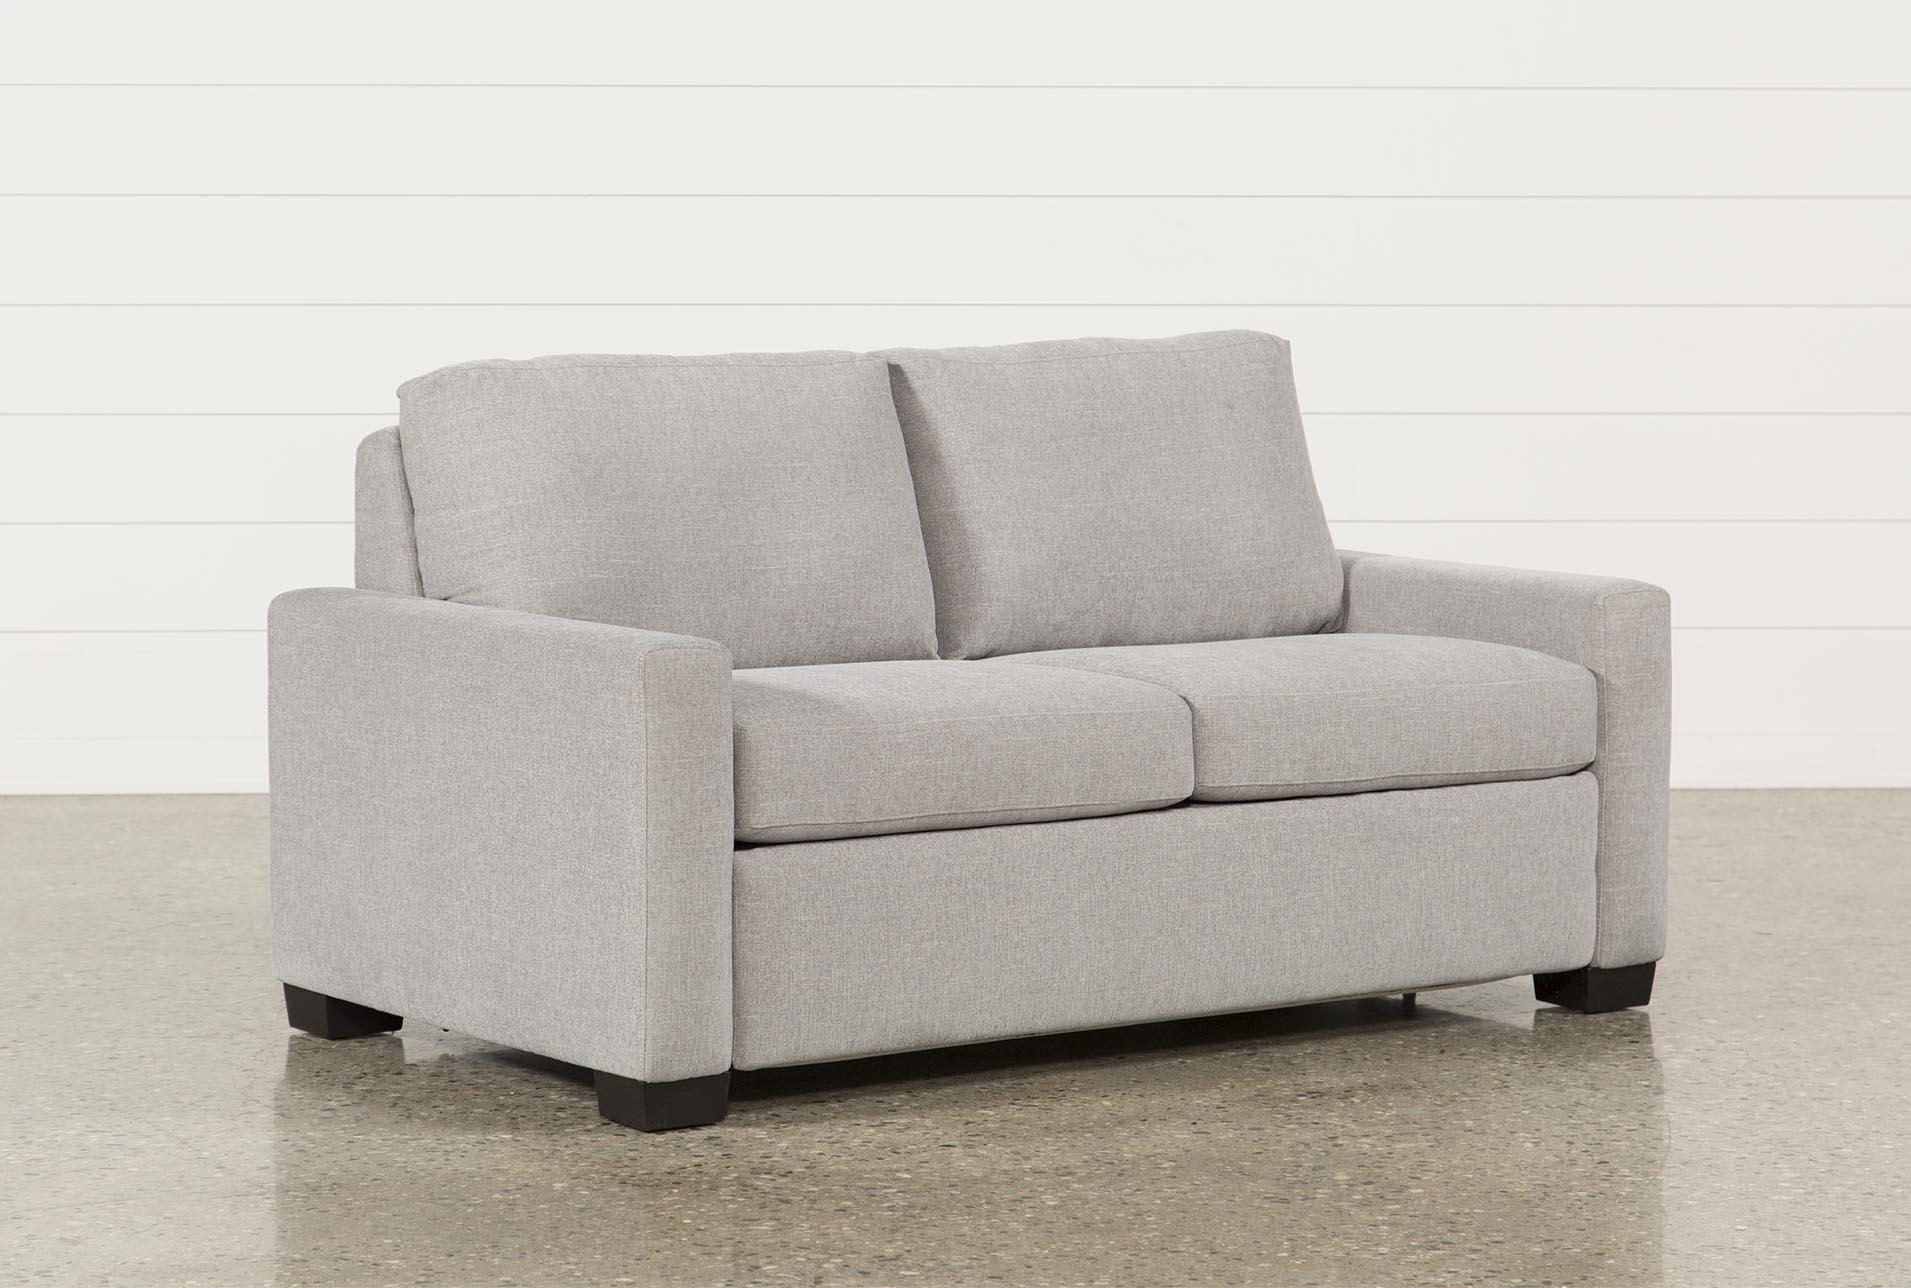 mackenzie silverpine full sofa sleeper living spaces rh livingspaces com full size sleeper sofa ikea full size sleeper sofa sale